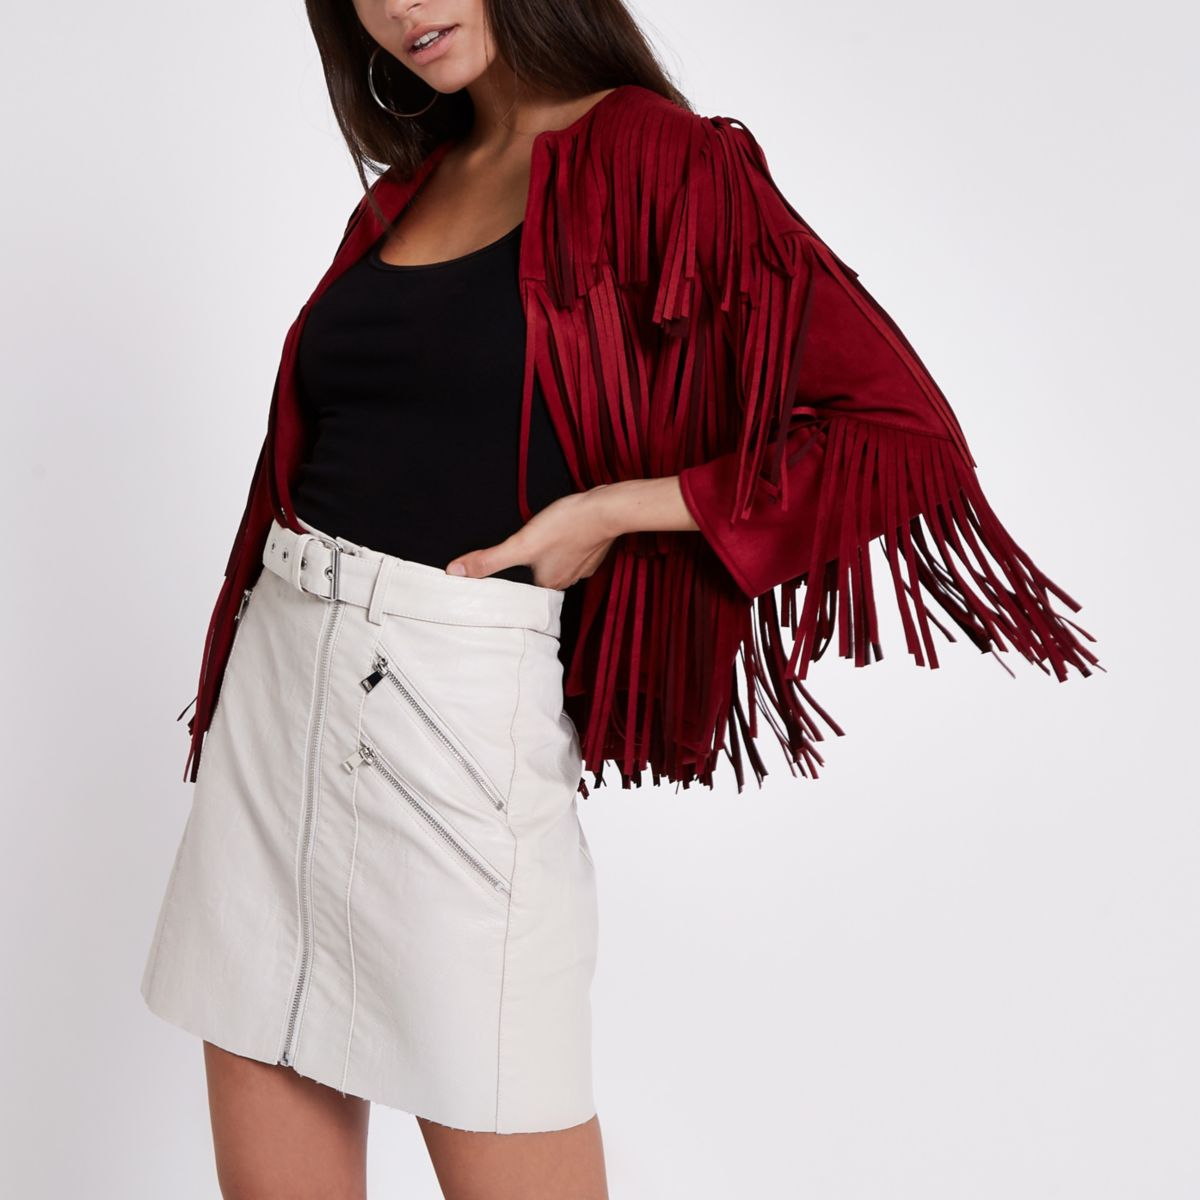 Cream faux leather belted biker mini skirt